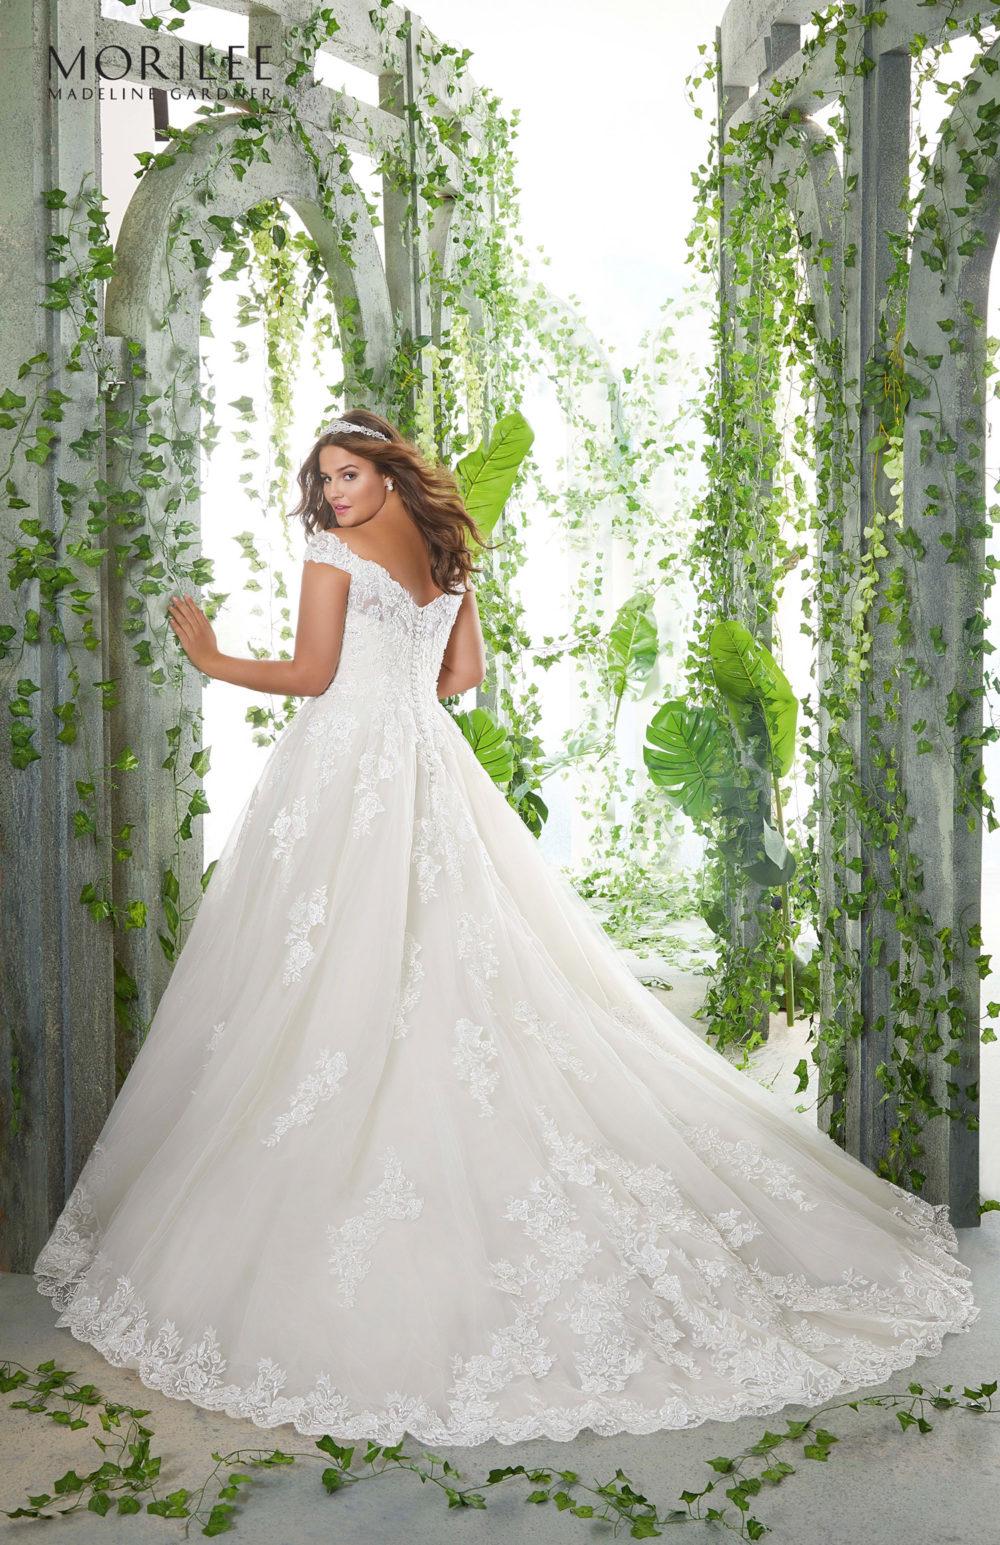 Mariages: abito da sposa Curvy 2020 a Vicenza, Verona, Padova, Veneto 3254